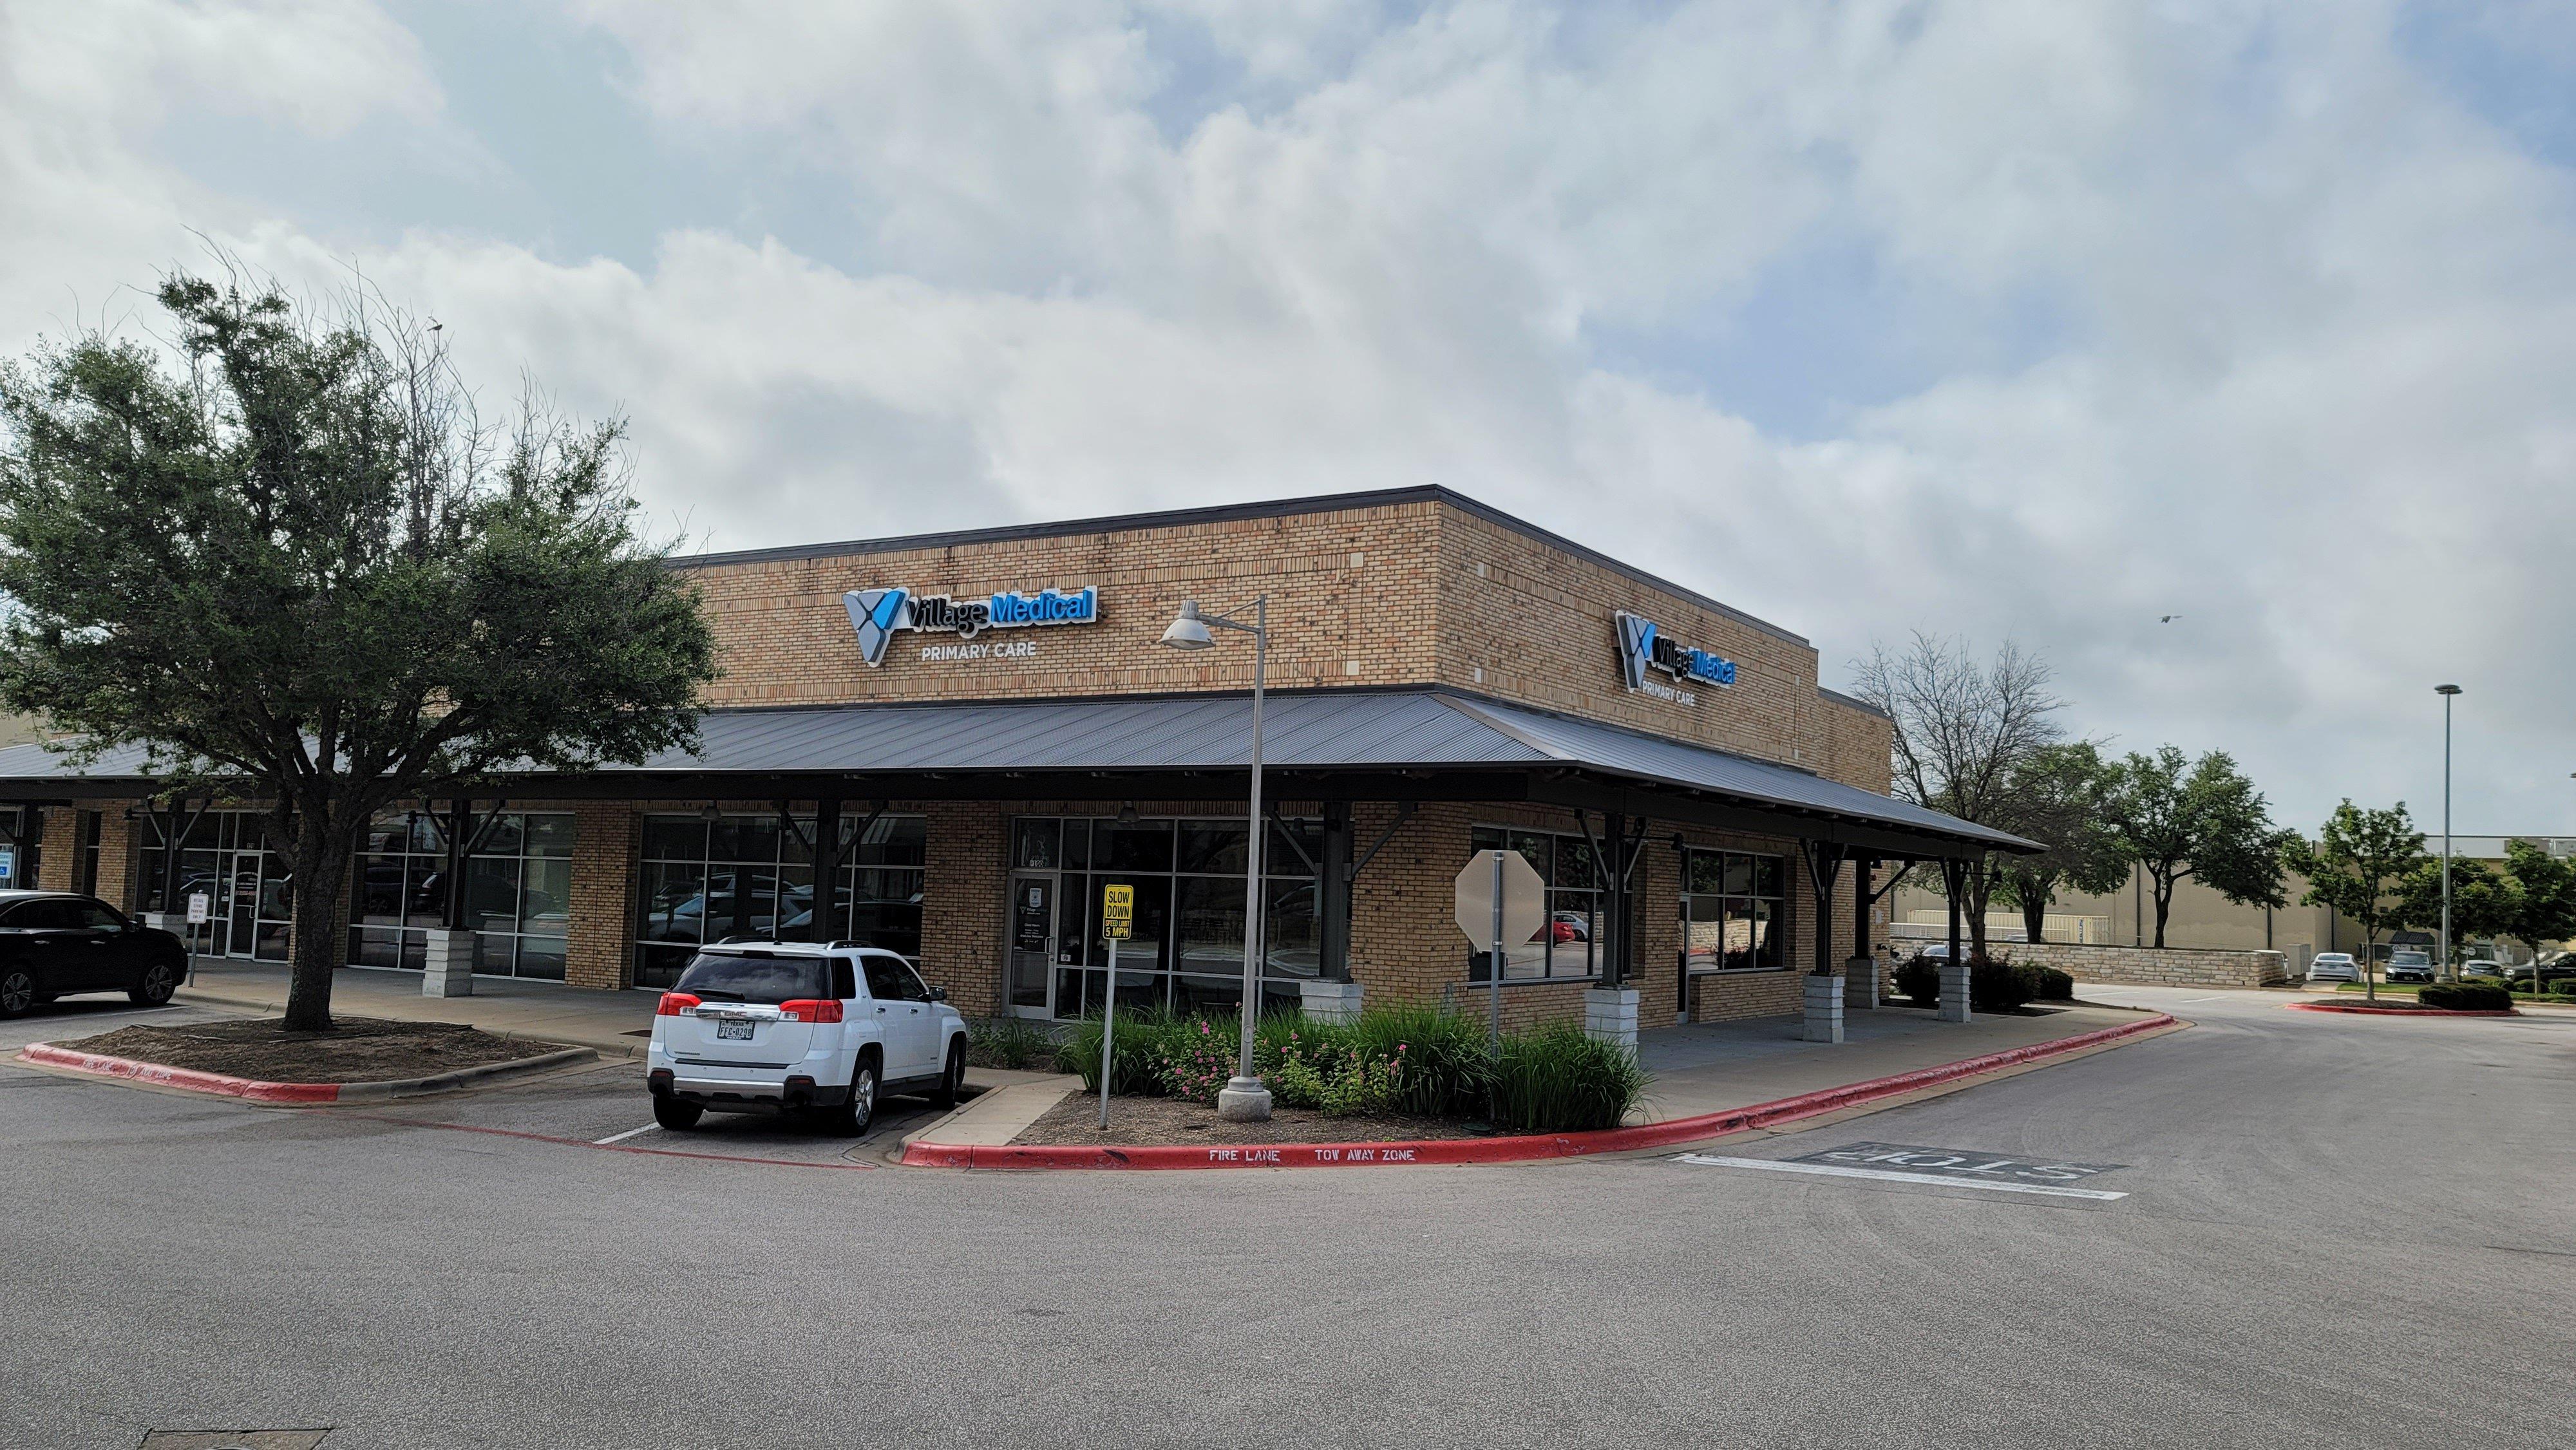 Village Medical - 1335 E Whitestone Blvd. Ste. P100 Cedar Park, TX 78613